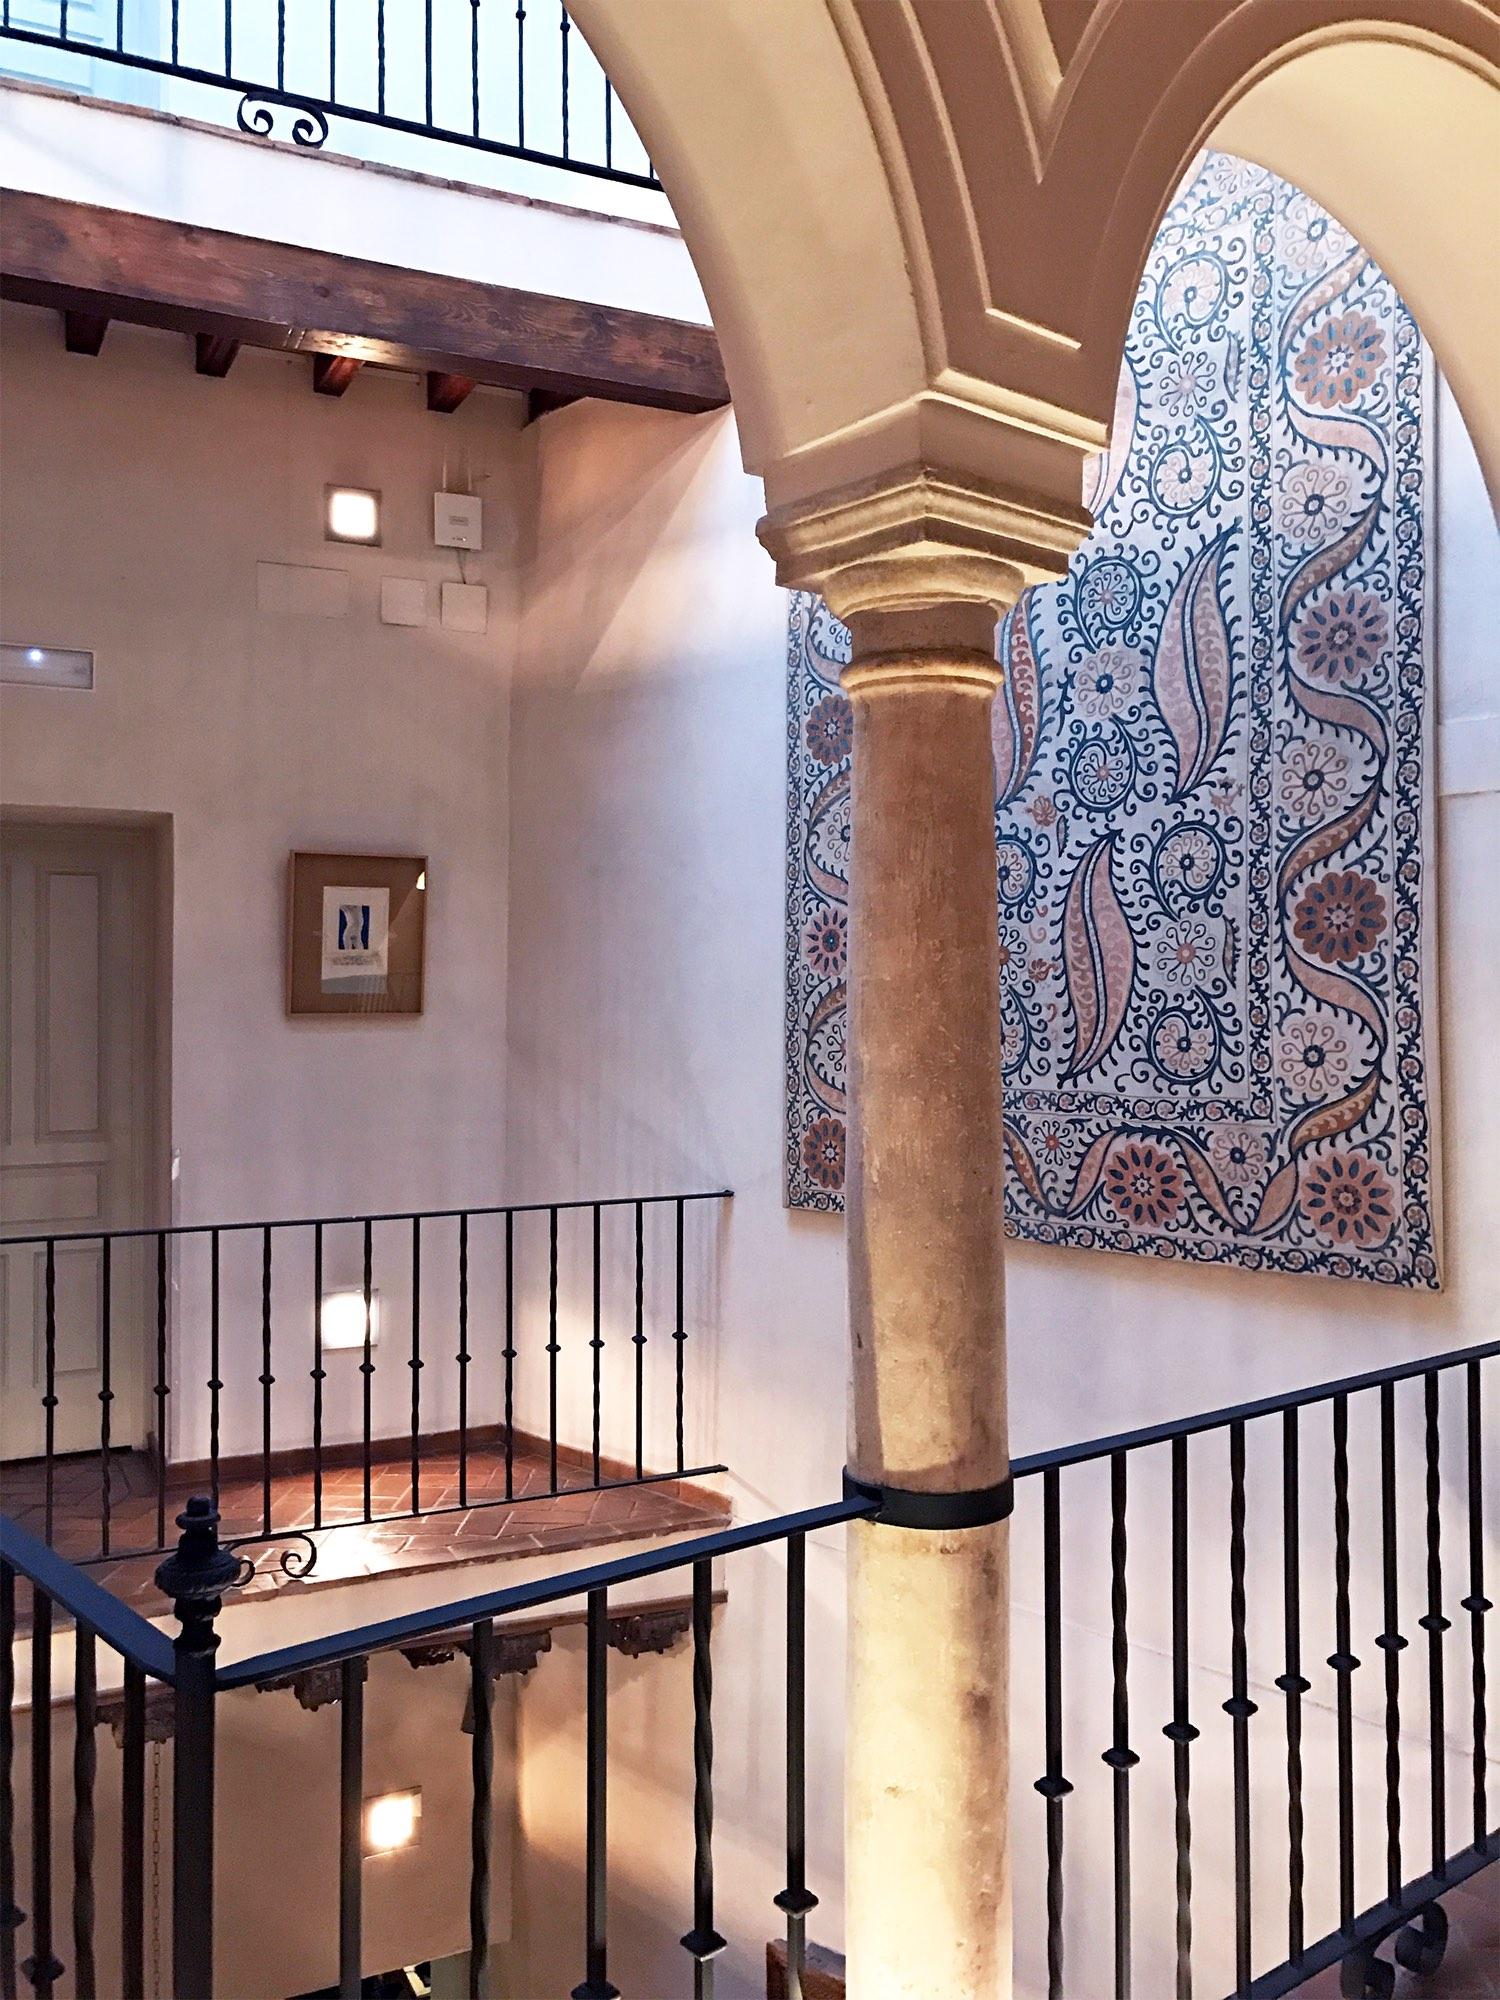 Corral del Rey hotel Seville Spain architecture.jpg